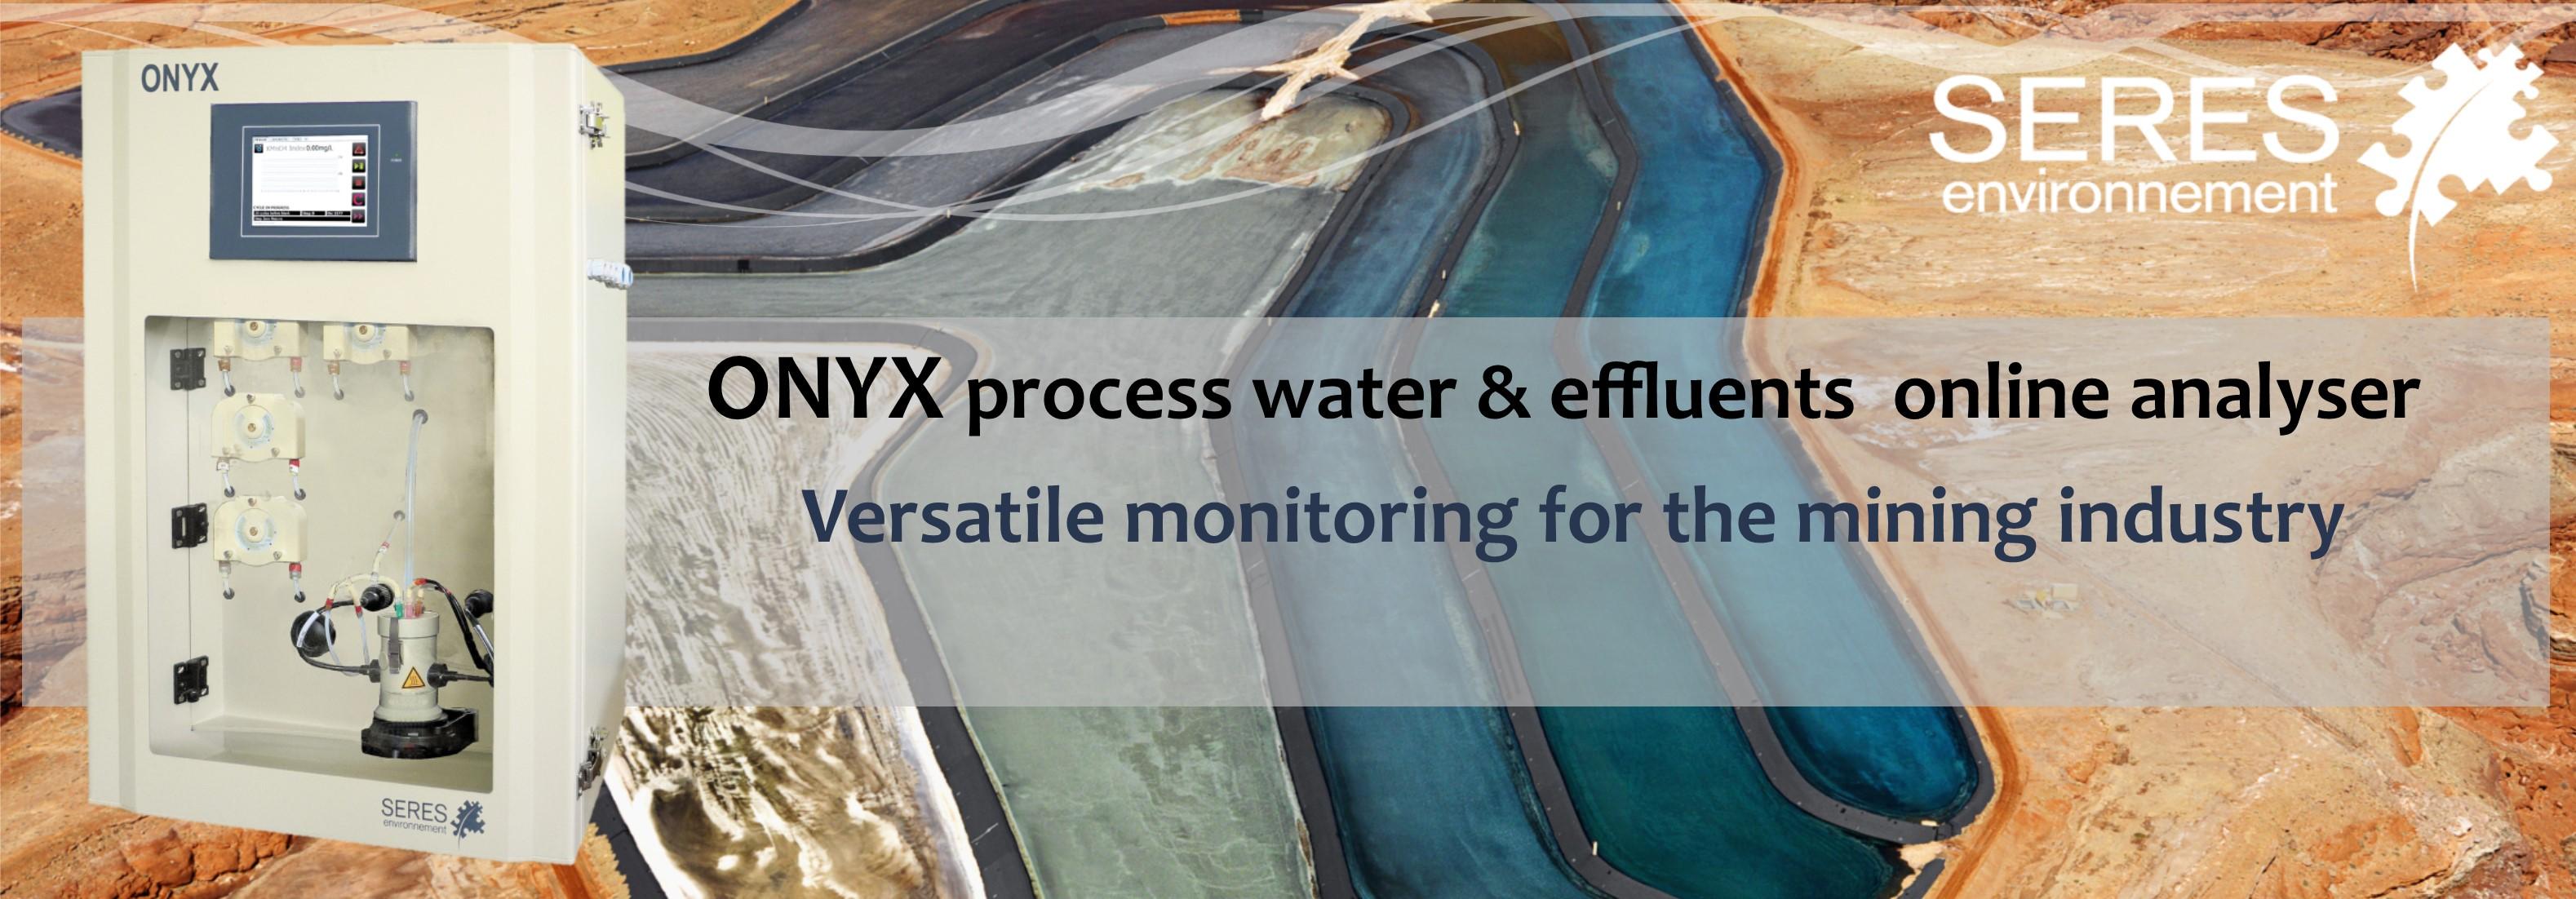 mining water analyser